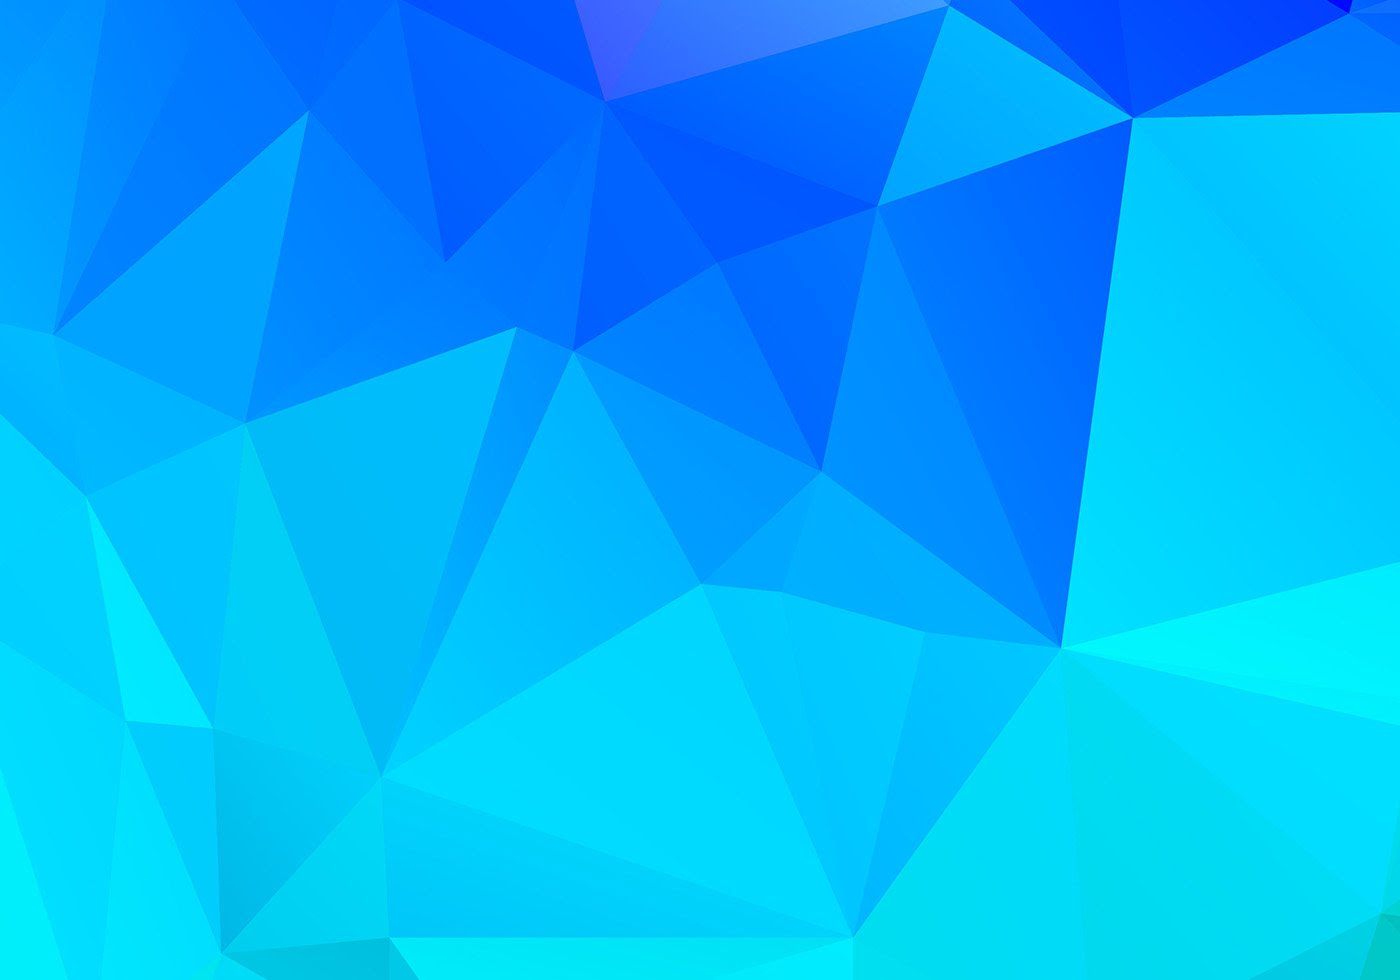 Unduh 100 Background Blue Hd Images HD Paling Keren